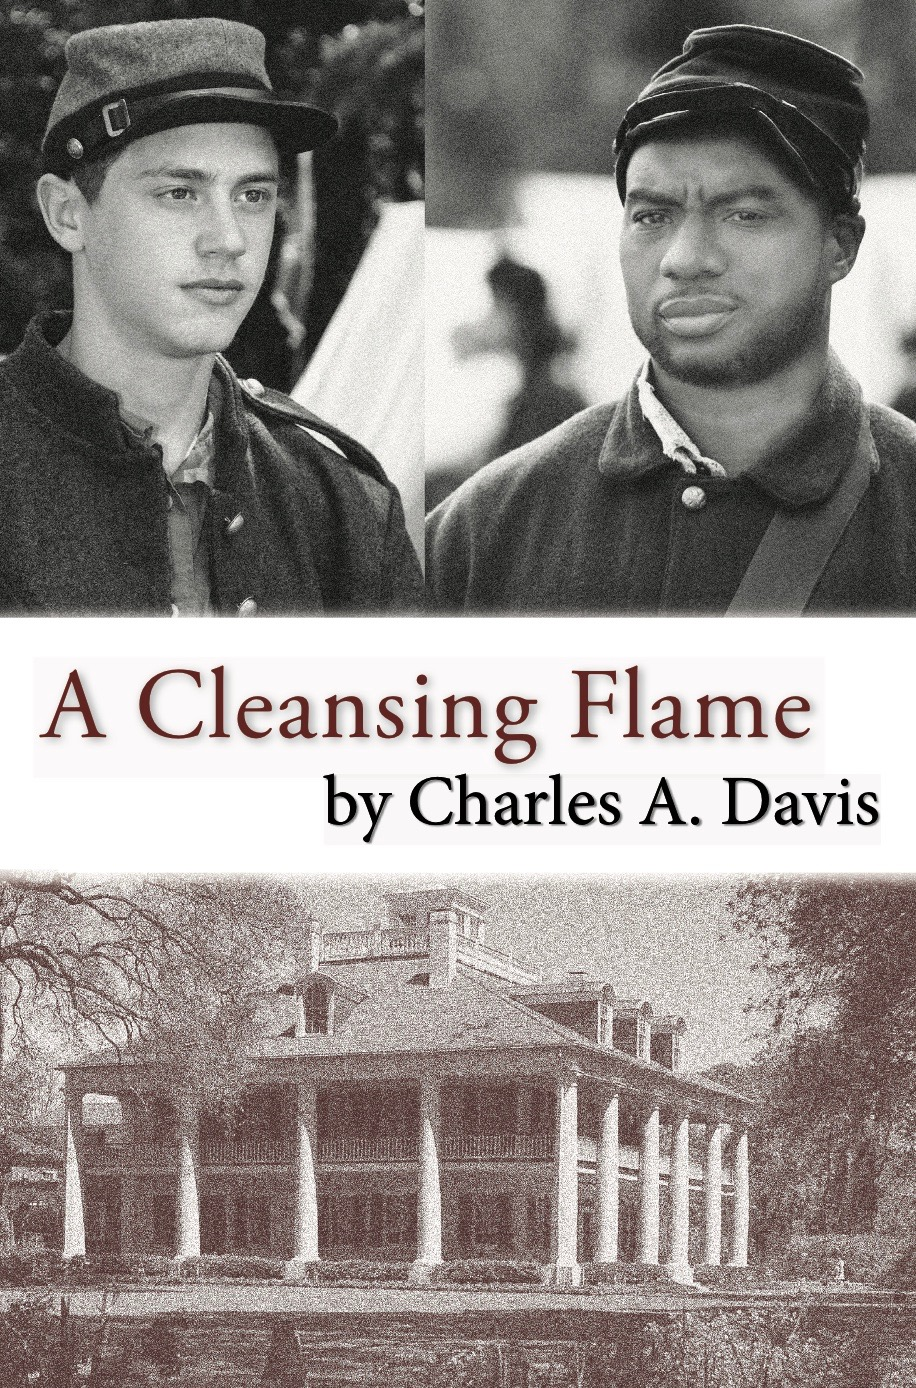 A cleansing flame.pdf.jpeg